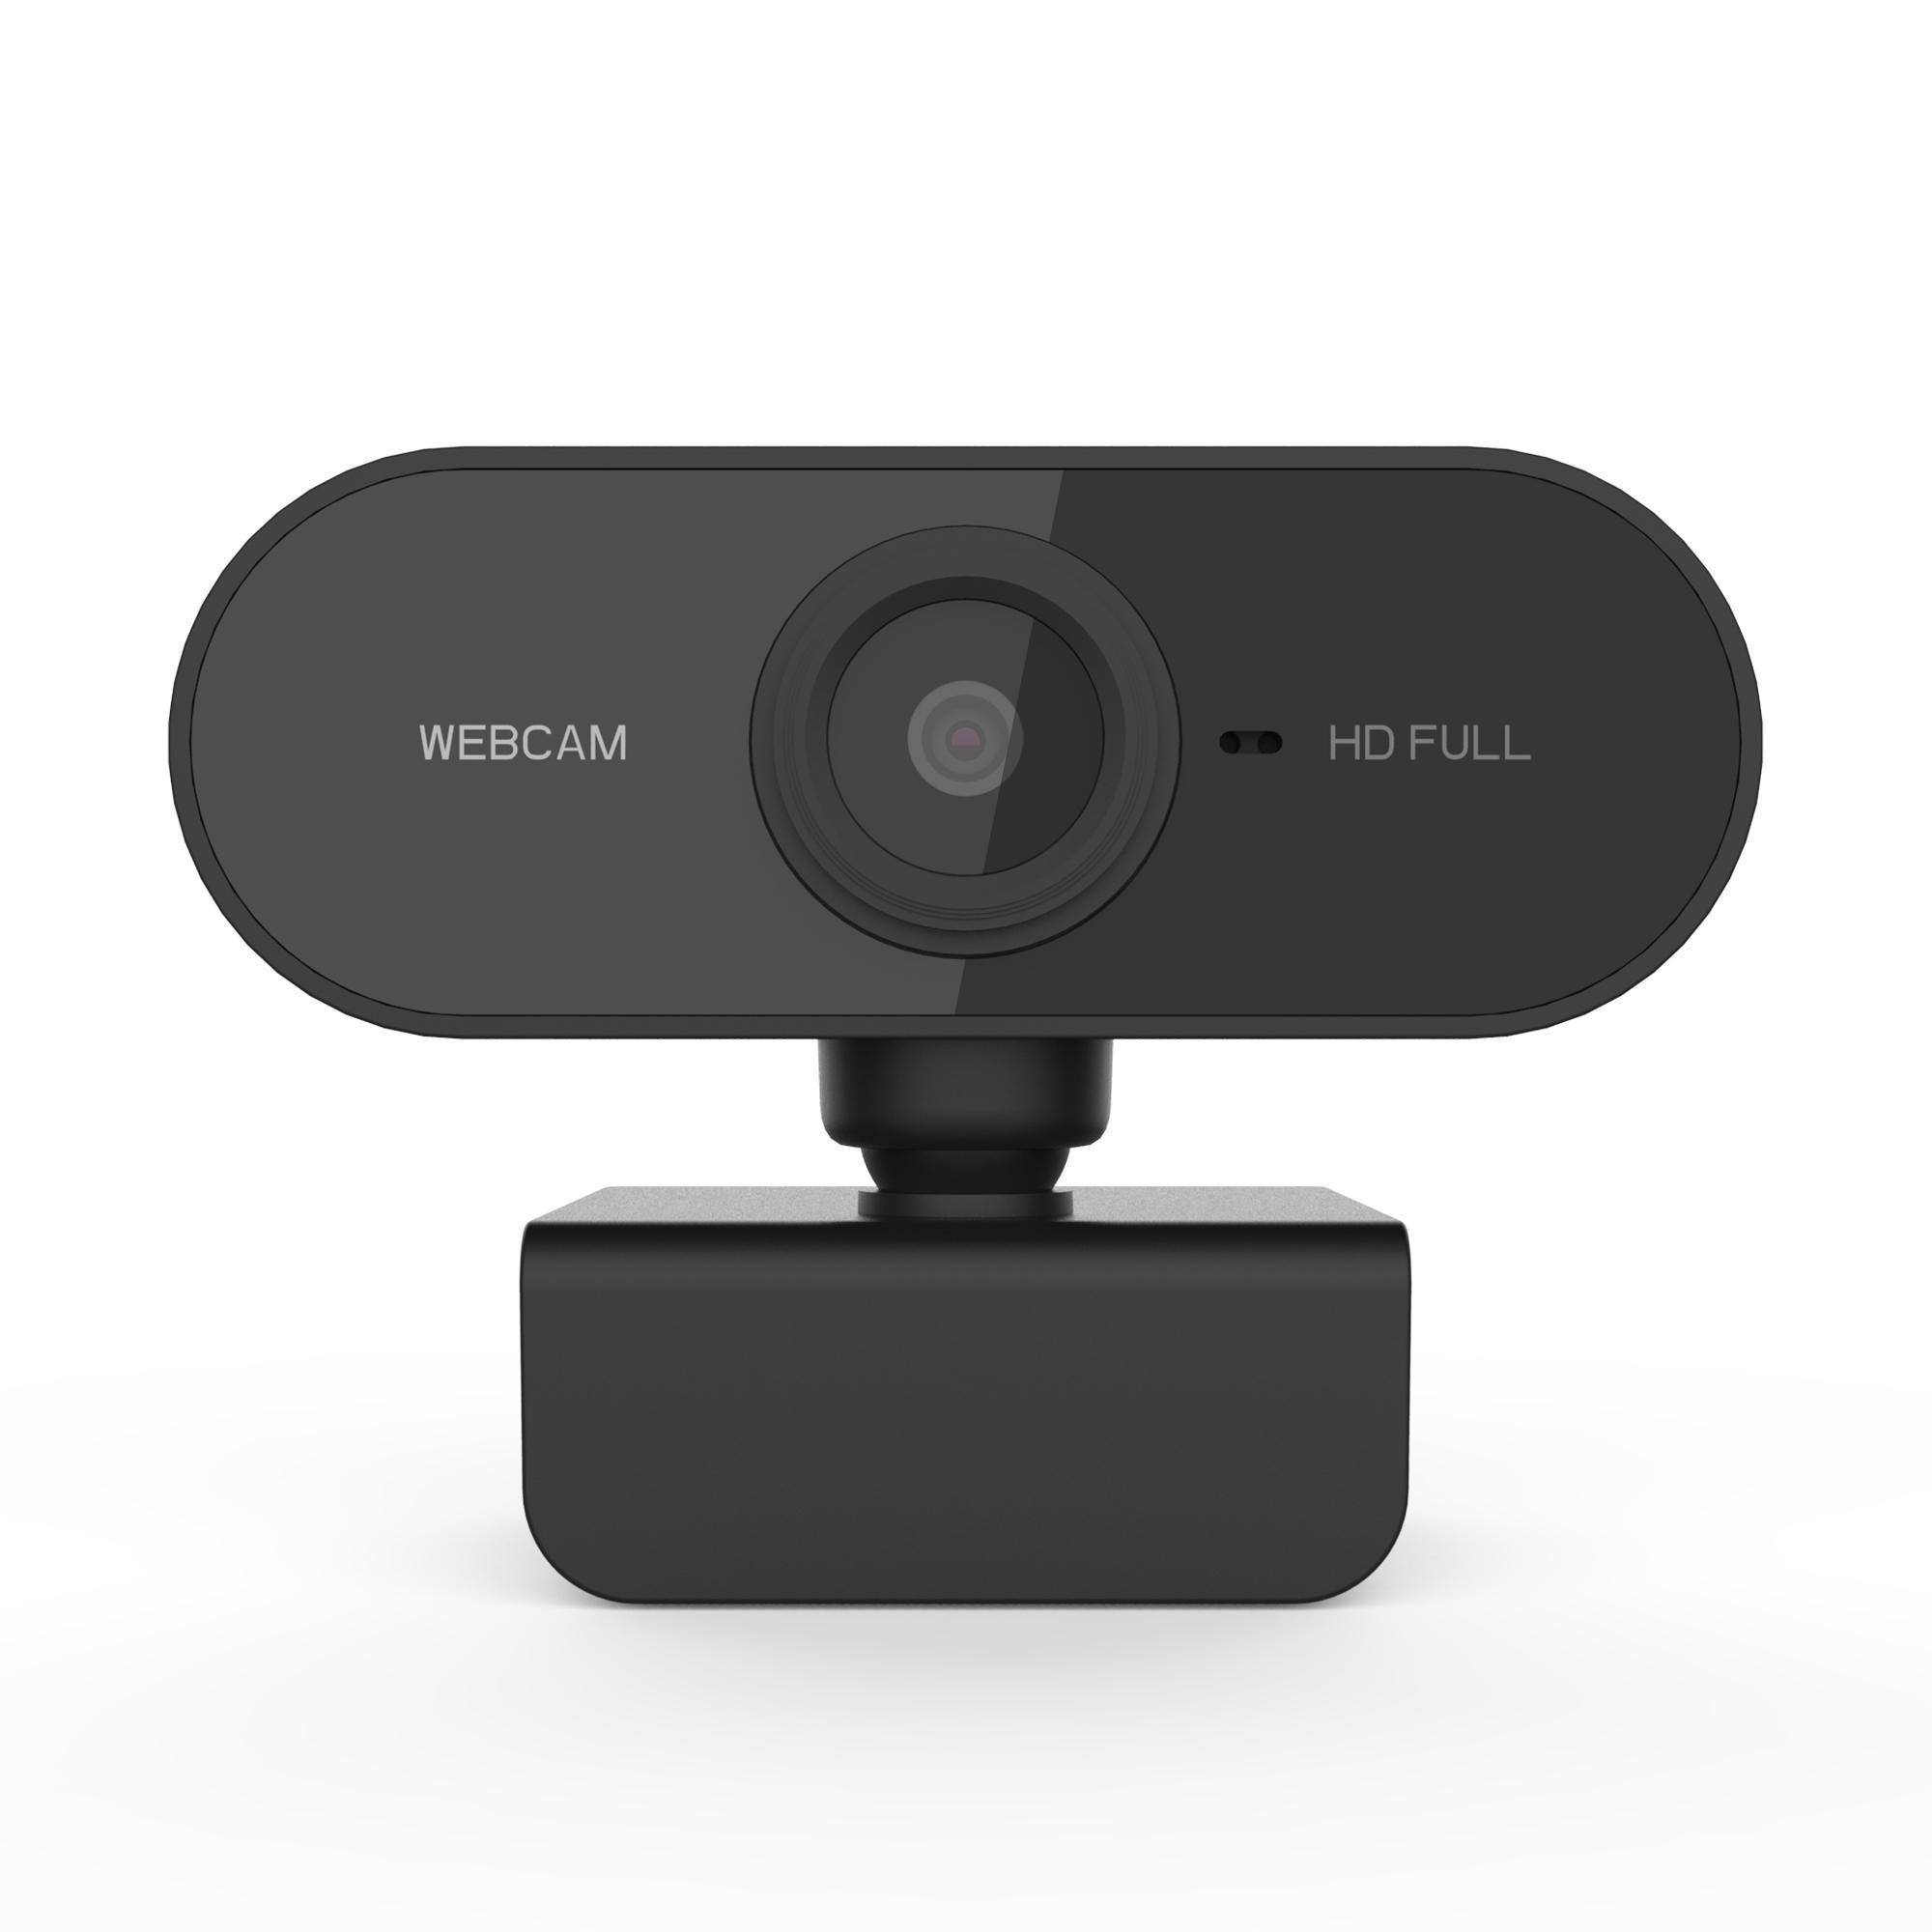 Full HD 720P Webcam USB Mini Computer Camera Built-in Microphone 360 degreeFlexible Rotatable webcam for Laptops Desktop